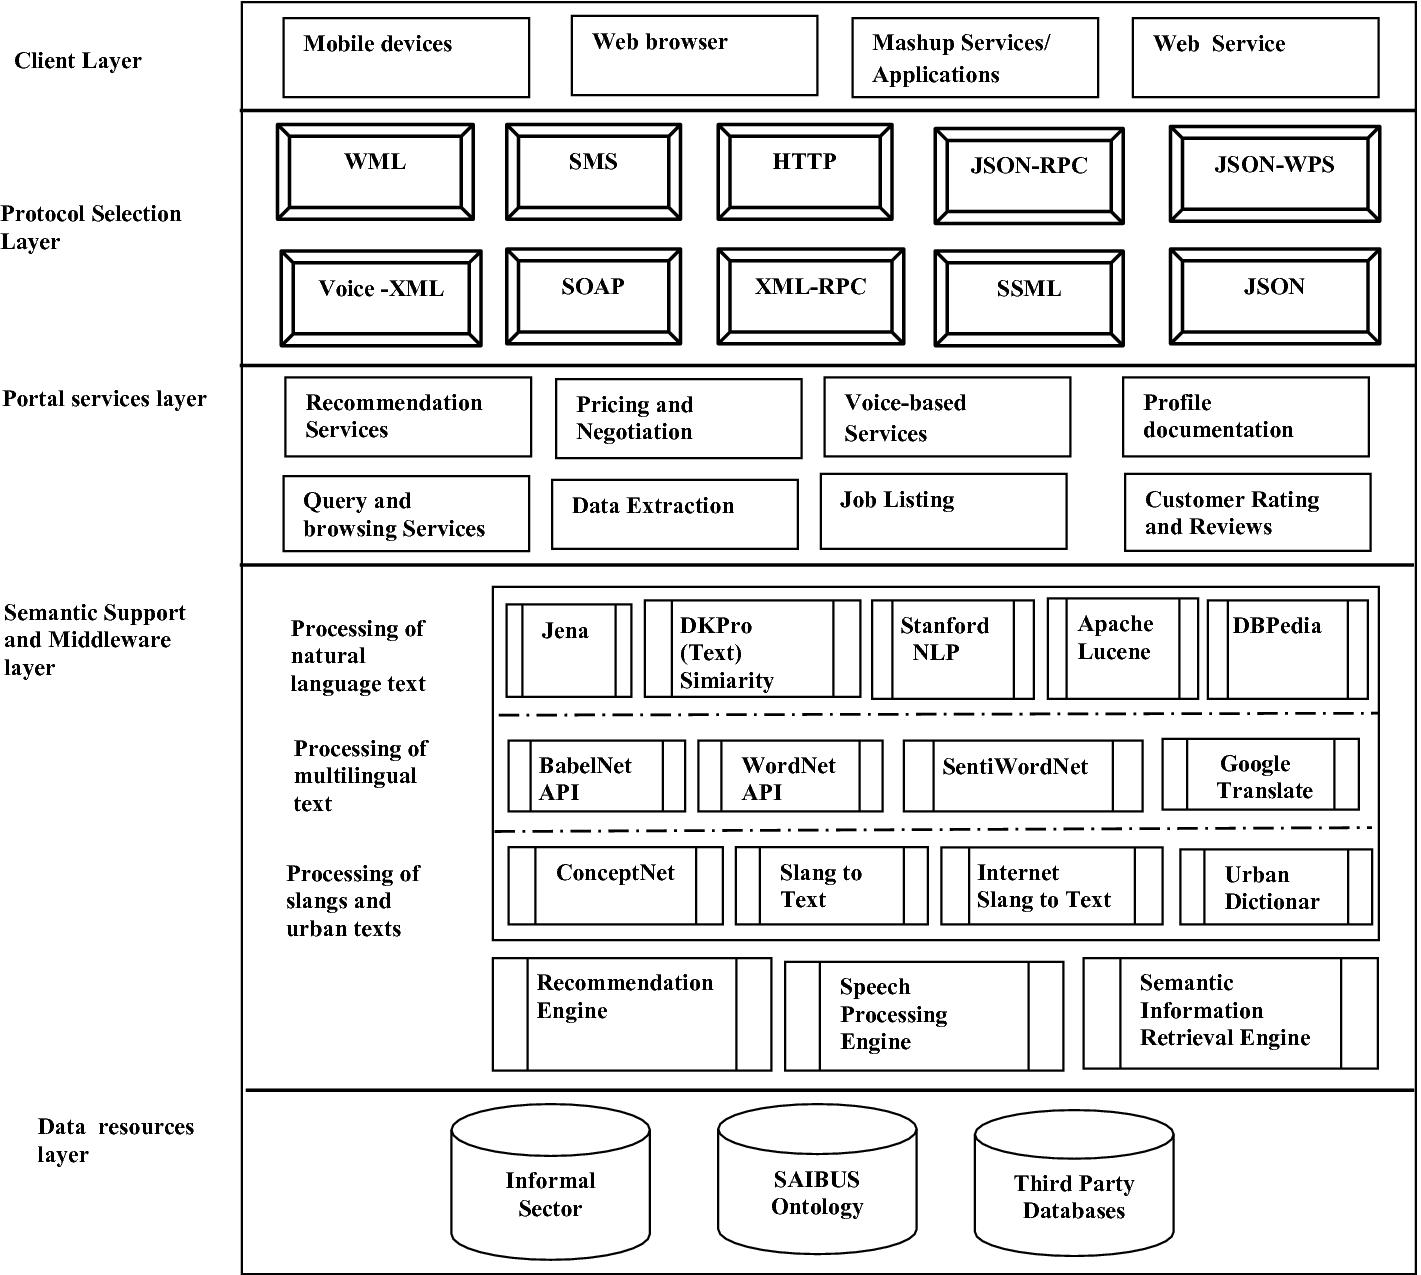 Towards a Multimodal Portal Framework in Support of Informal Sector